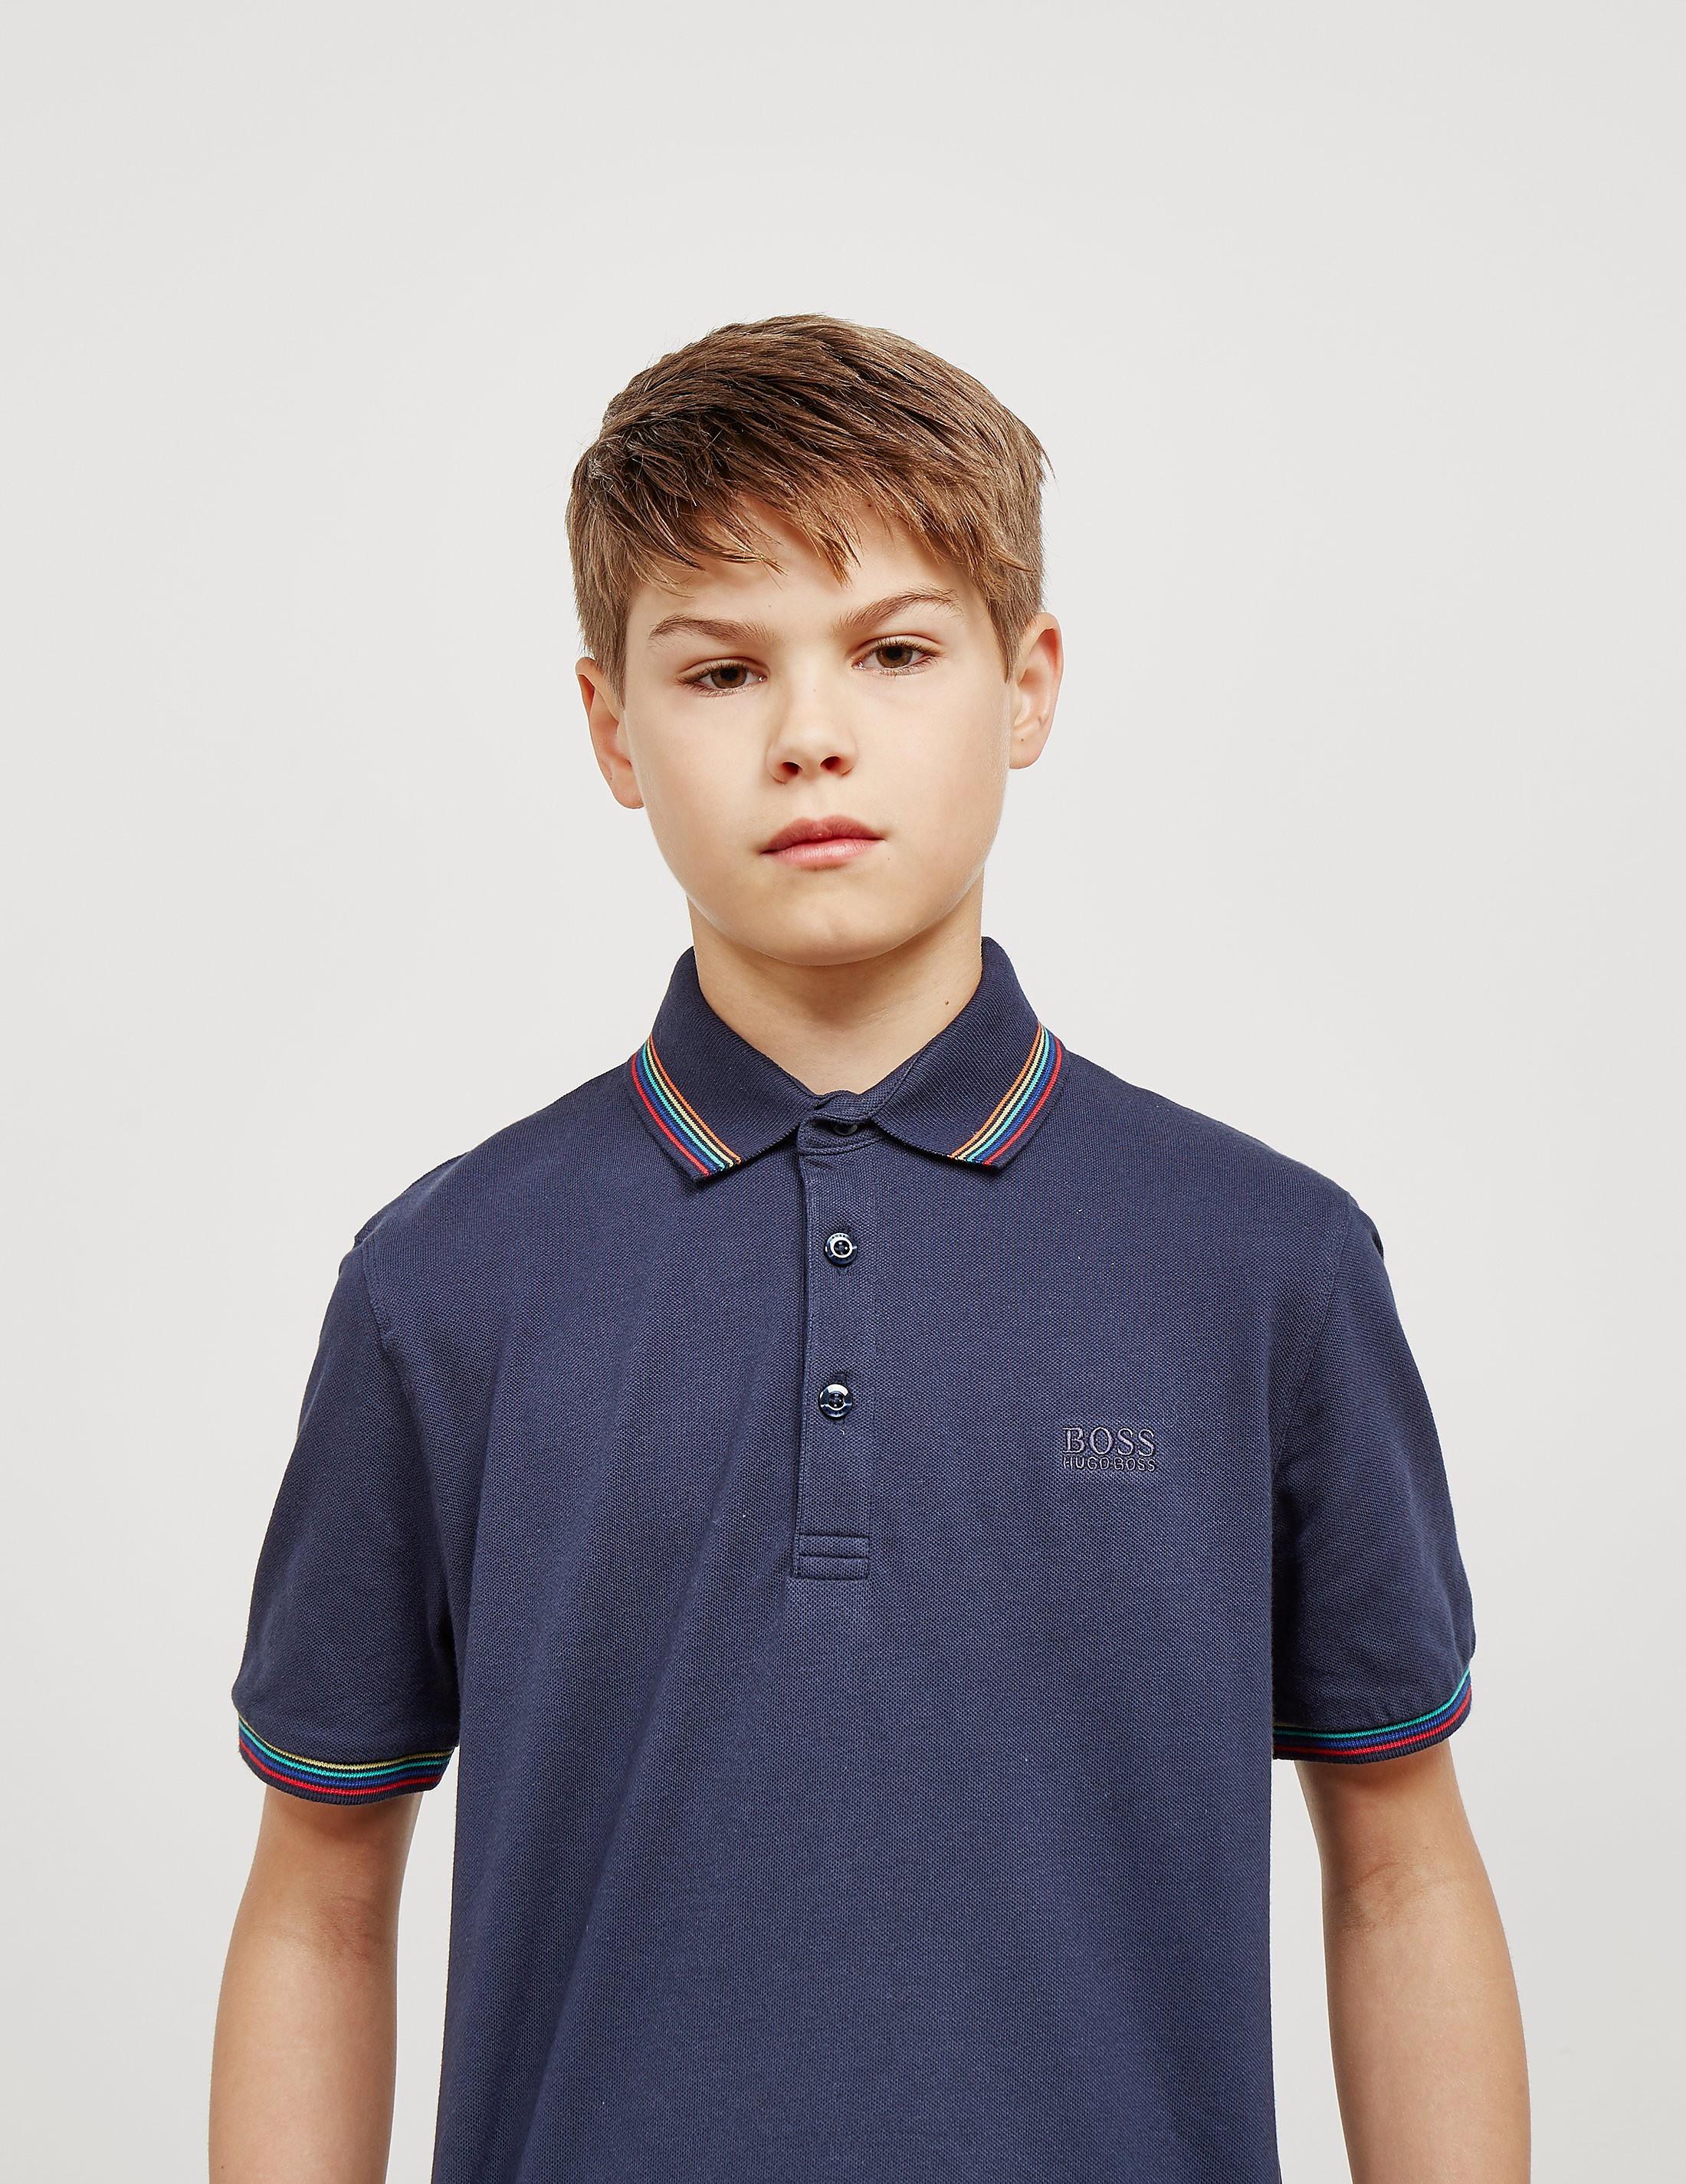 BOSS Special Short Sleeve Polo Shirt